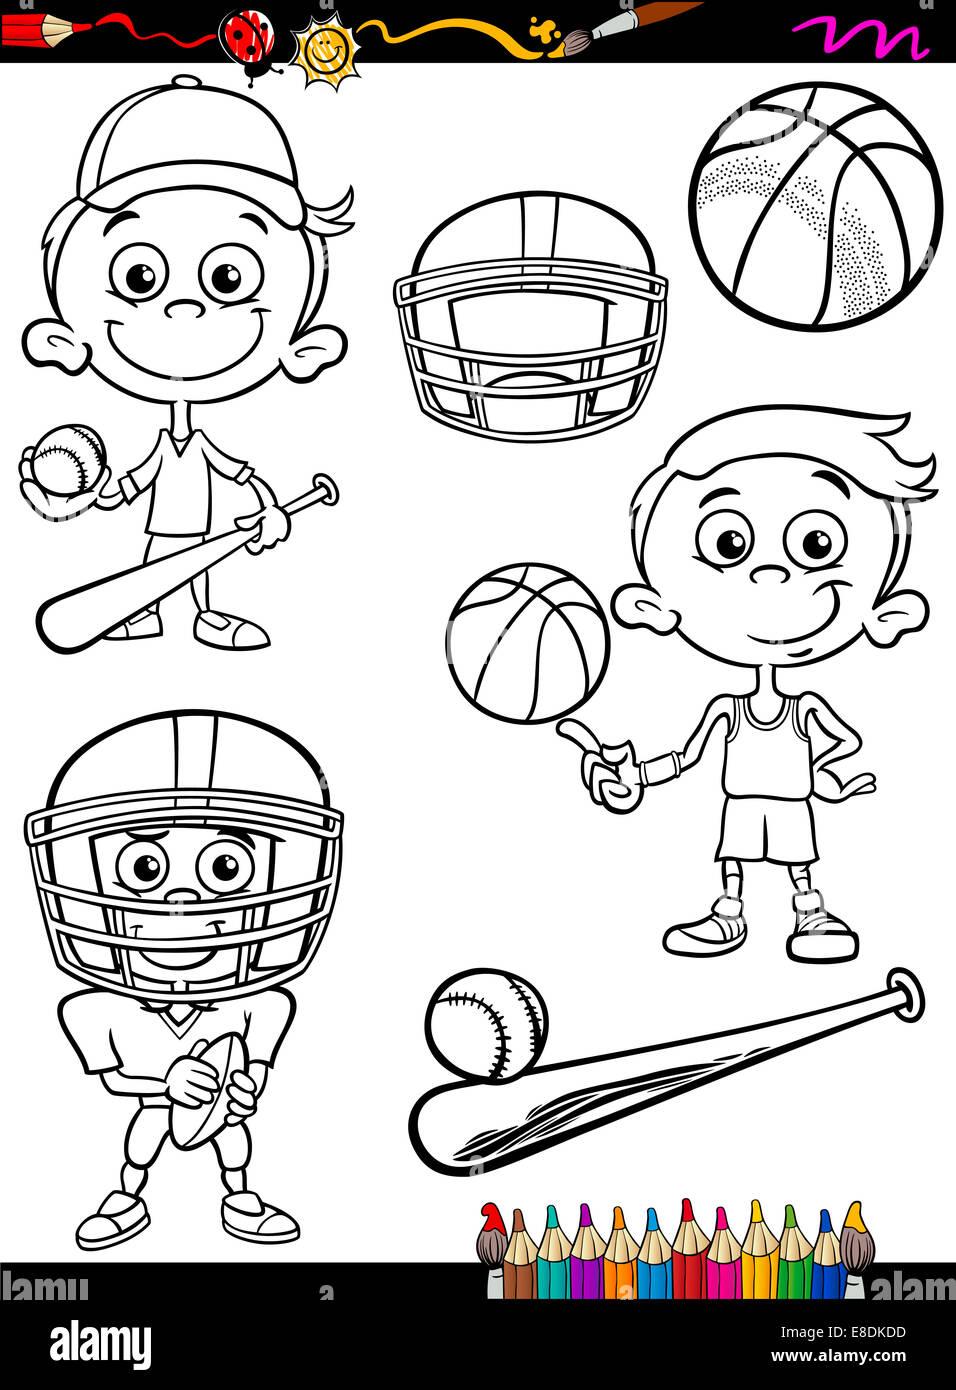 American Football Play Book Imágenes De Stock & American Football ...